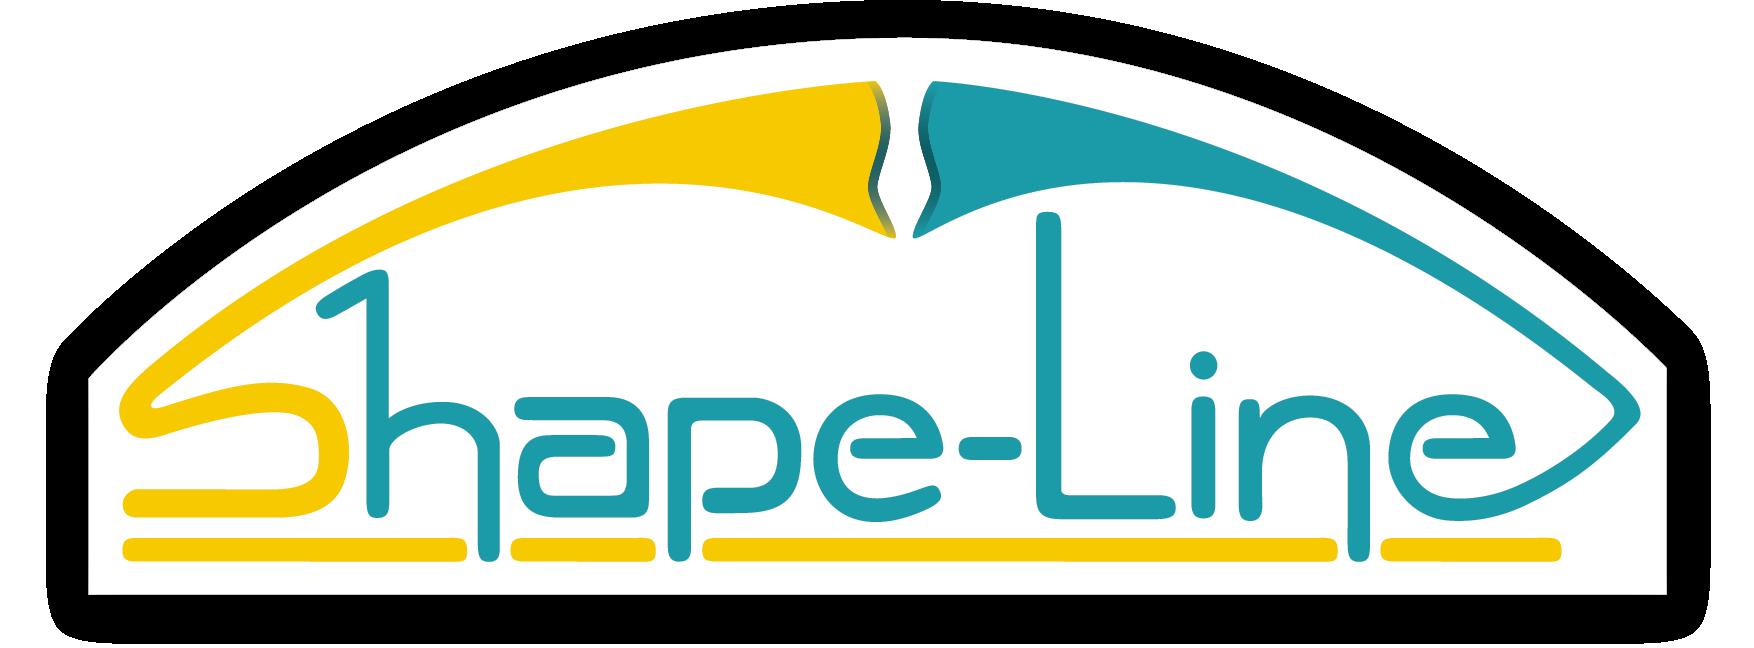 Shapeline - Shop